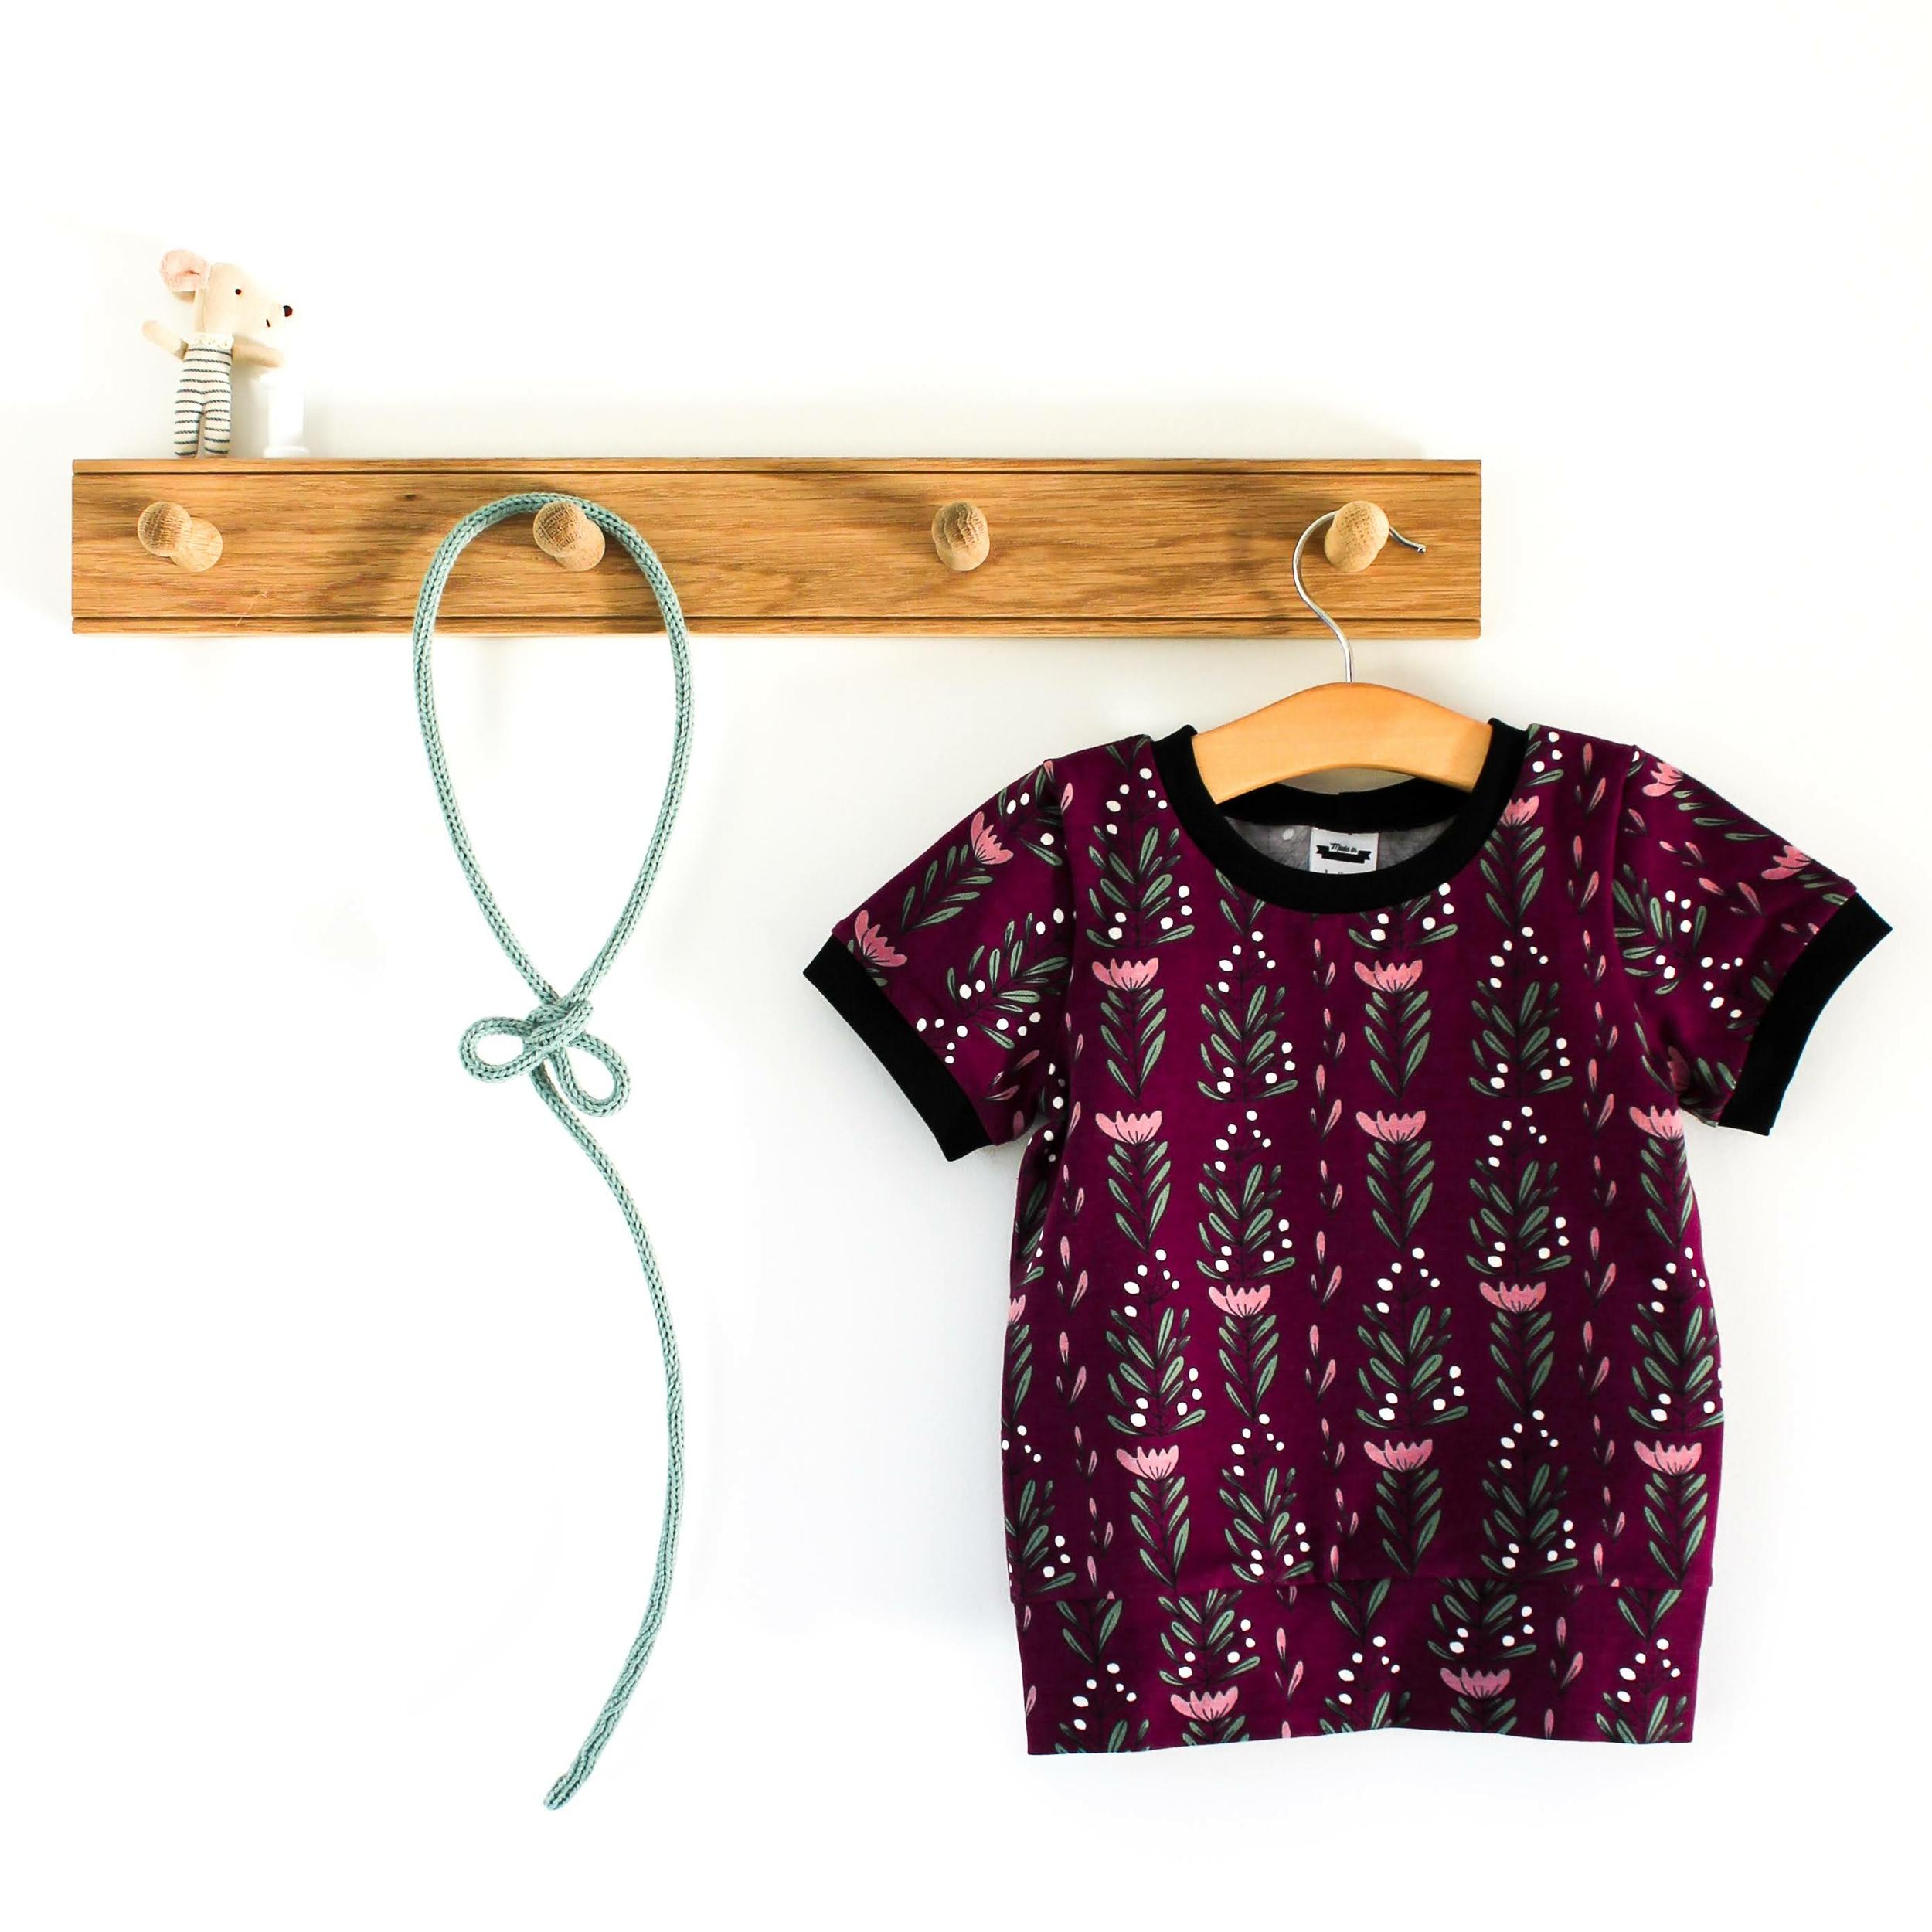 Tee-shirt évolutif - FLOWERFEST